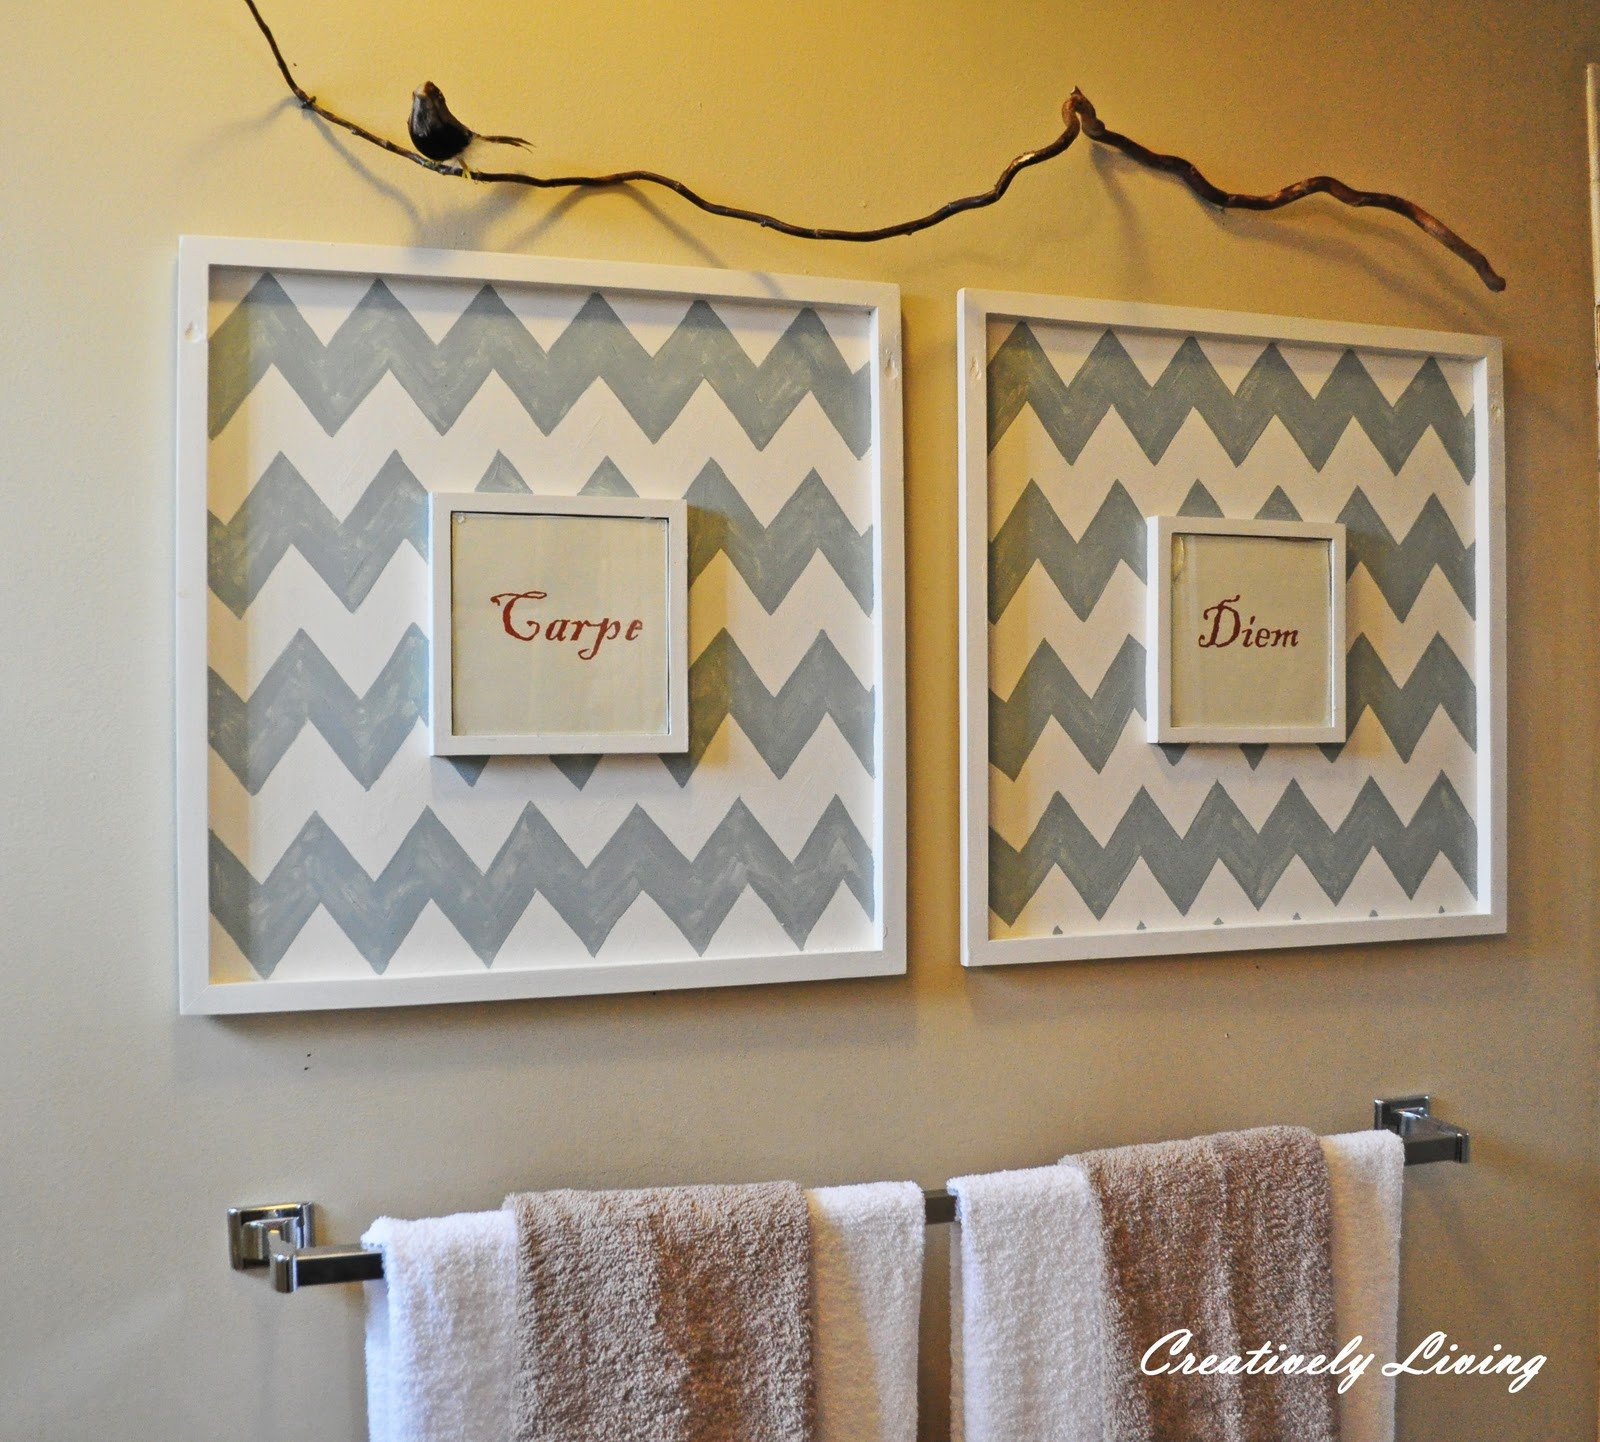 Bathroom Wall Art Creatively Living Blog